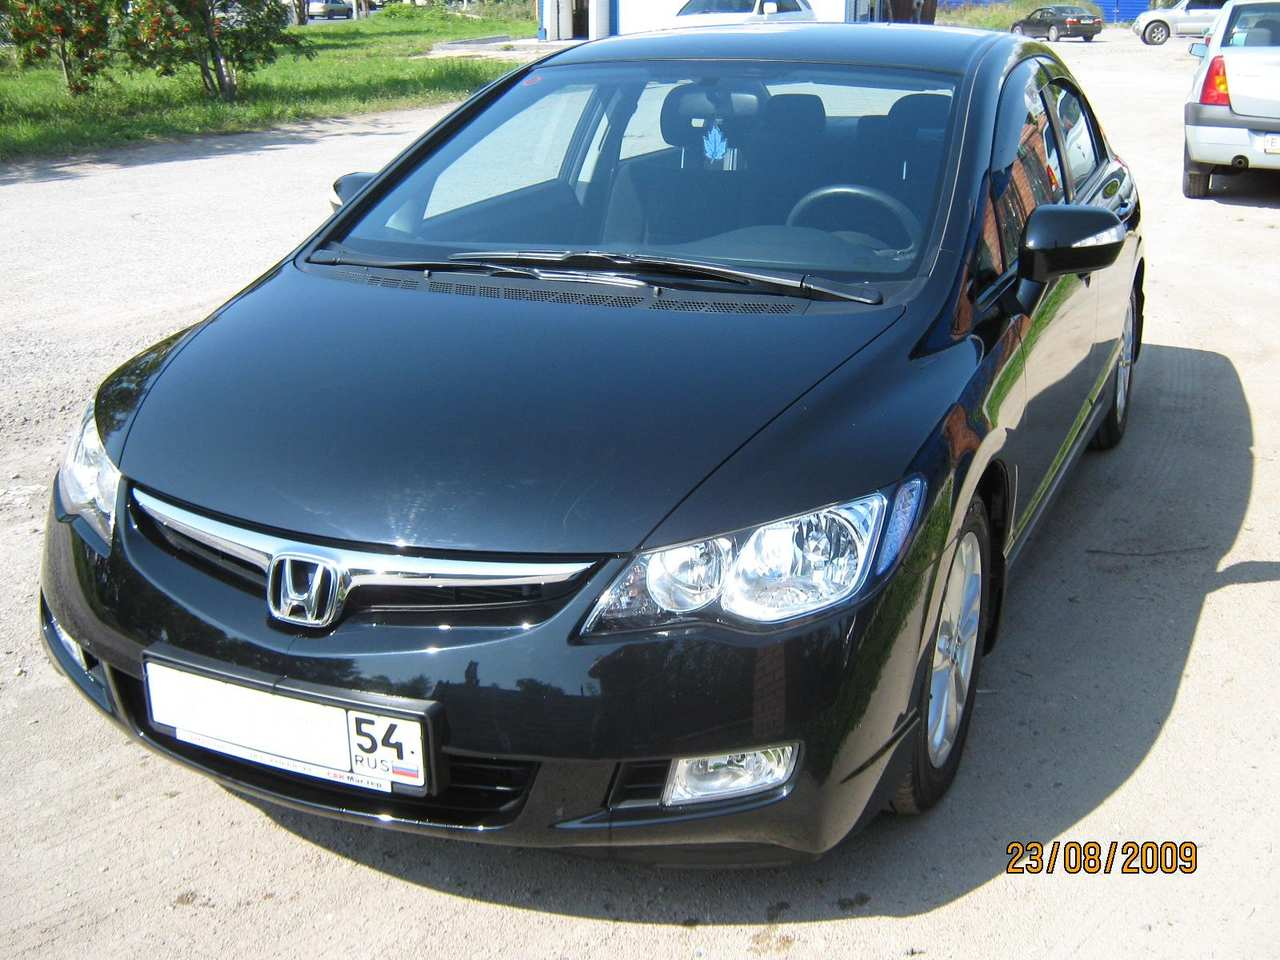 2007 honda civic pics 1 8 gasoline ff automatic for sale for Honda civic overheating